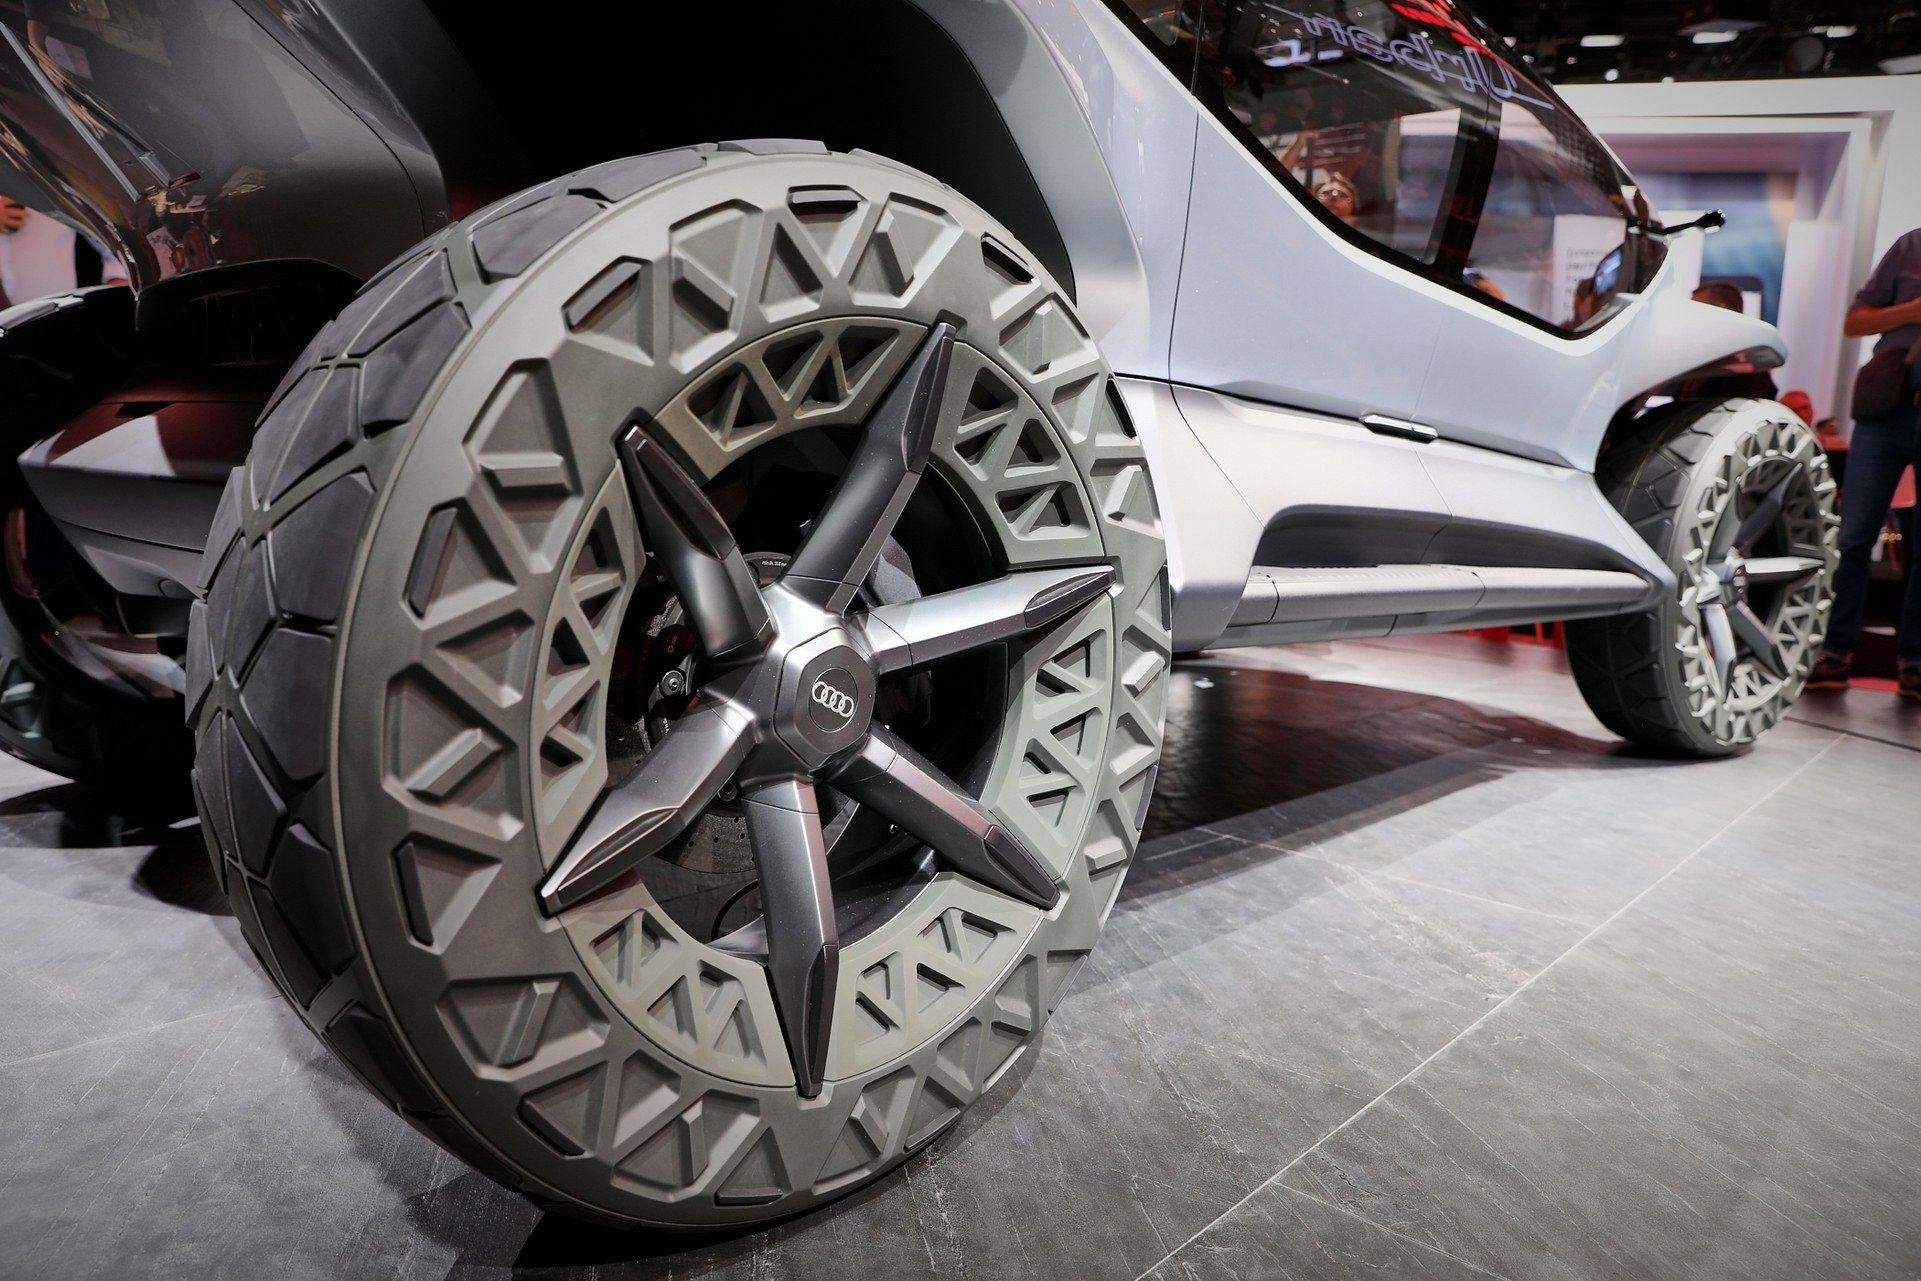 Audi AI:Trail - электрический внедорожник будущего с дронами вместо фар